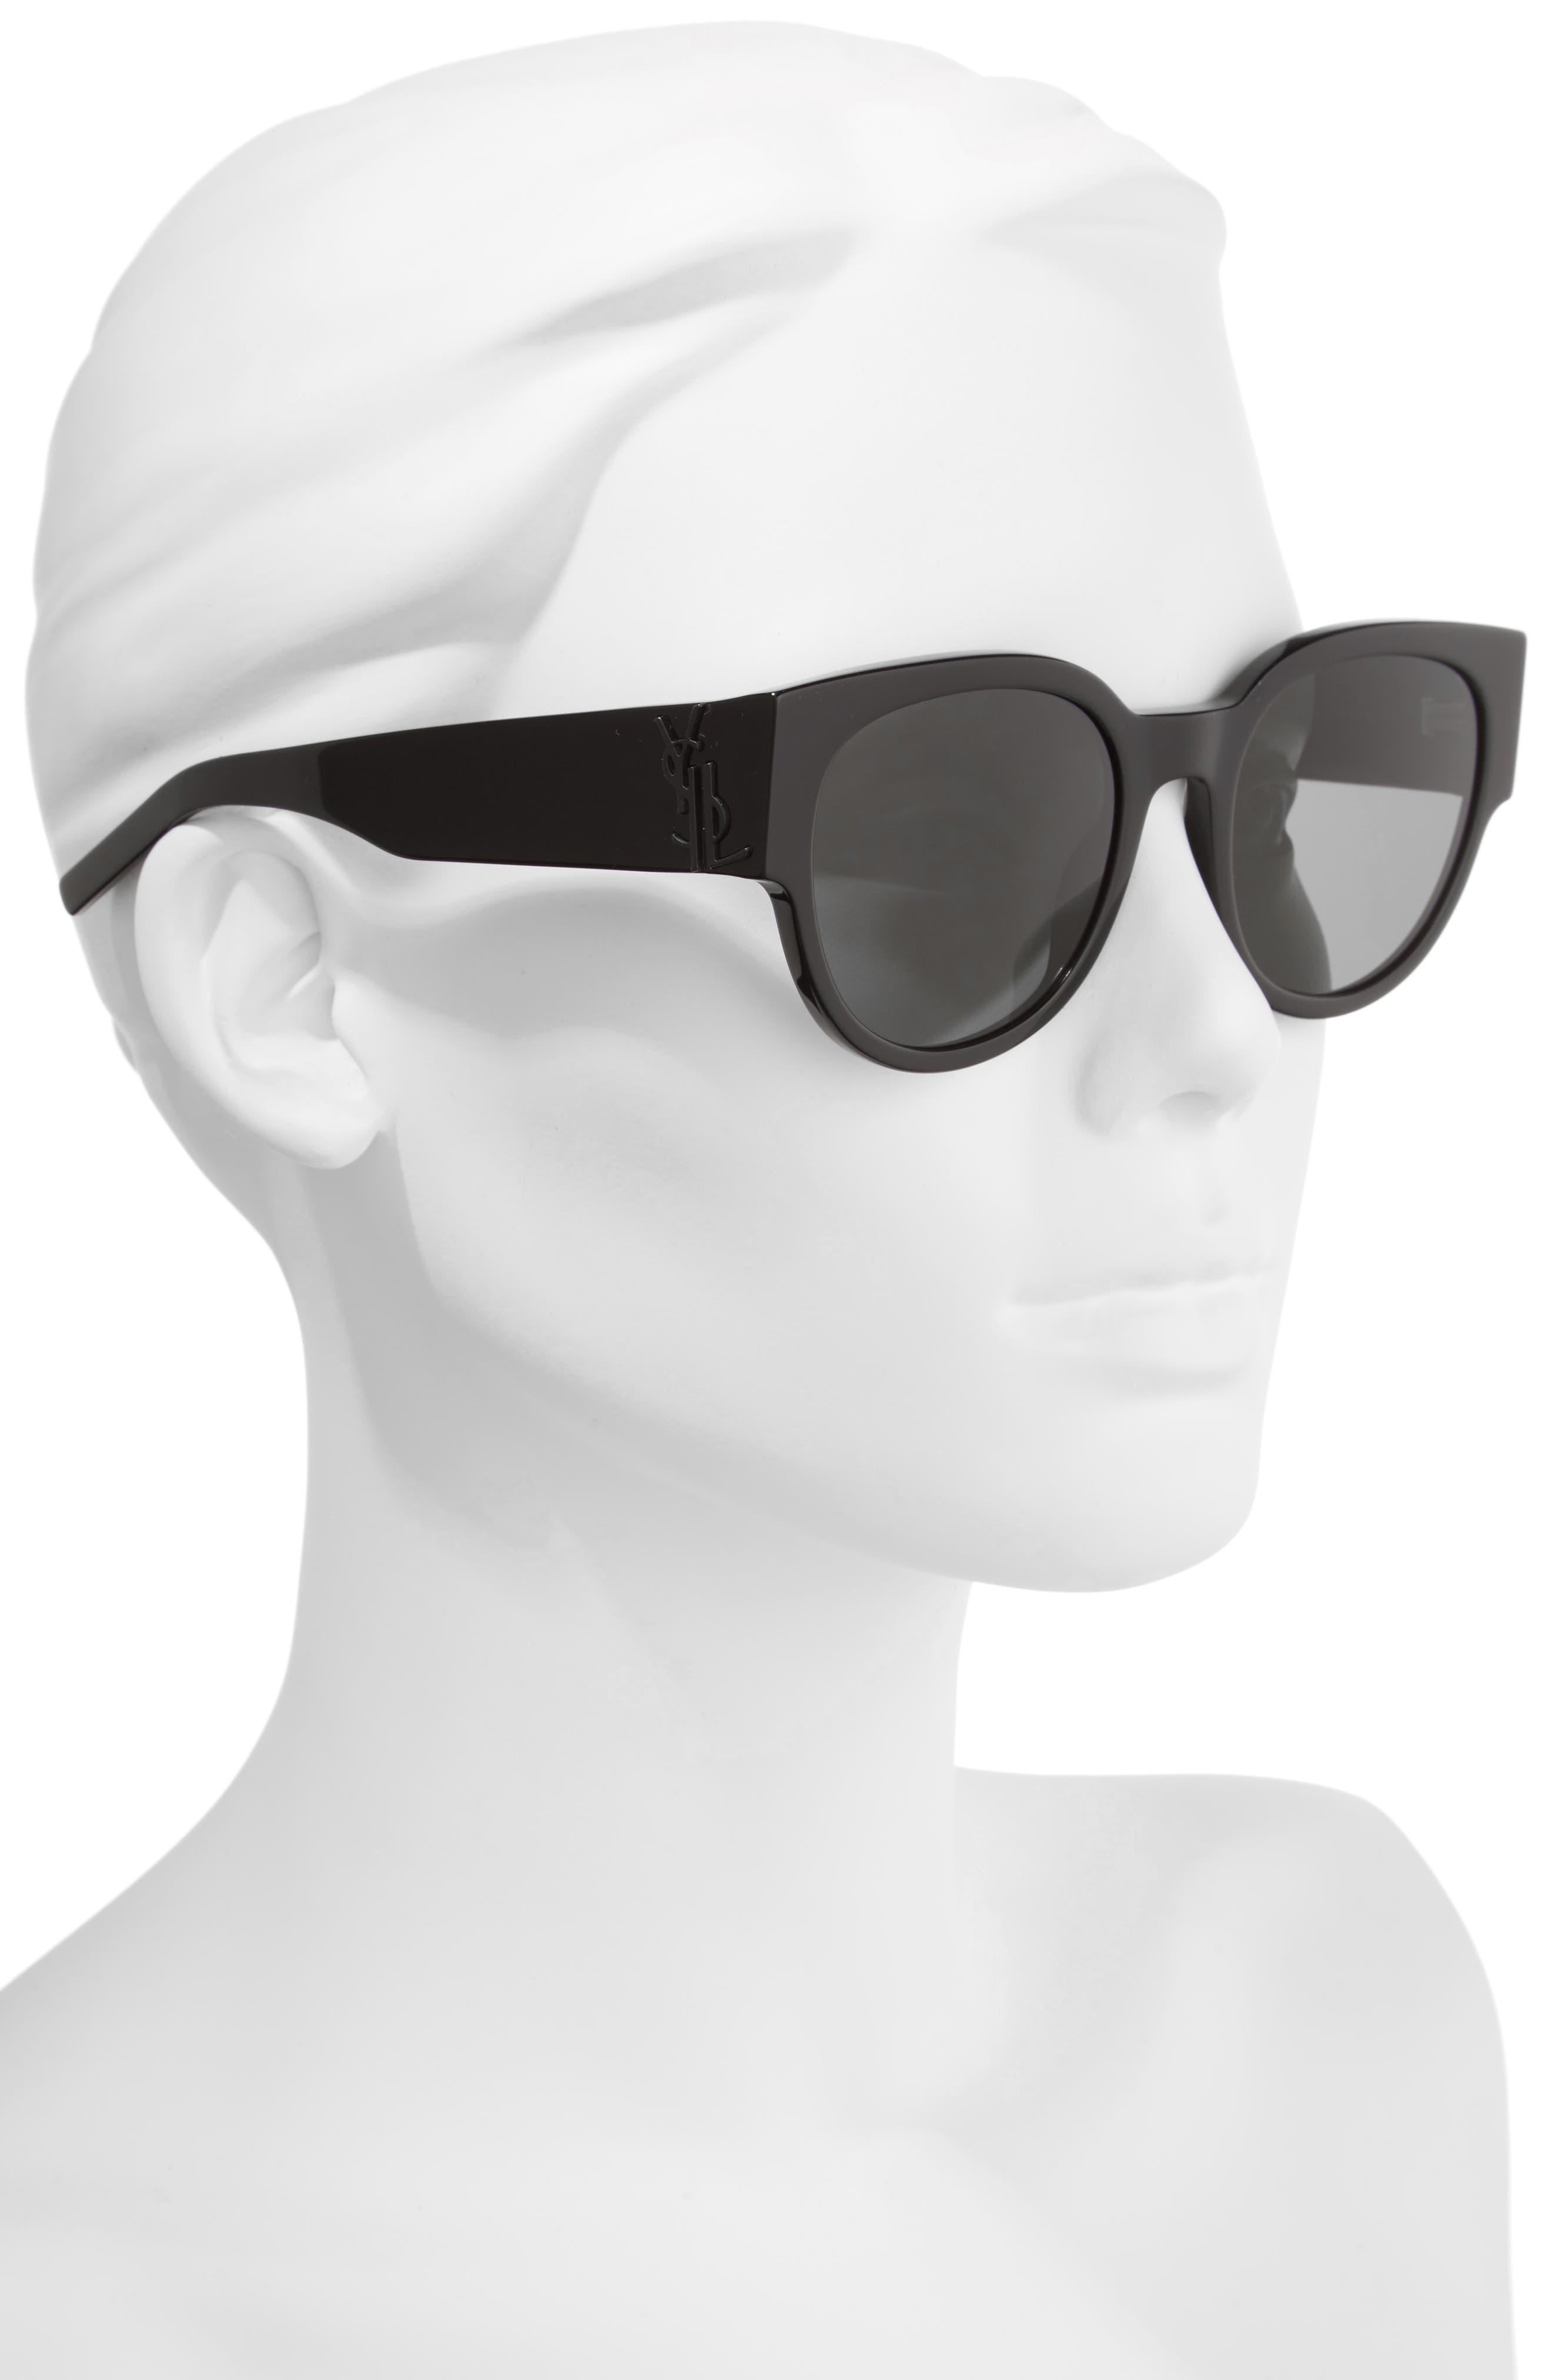 SL M19 54mm Cat Eye Sunglasses,                             Alternate thumbnail 2, color,                             BLACK